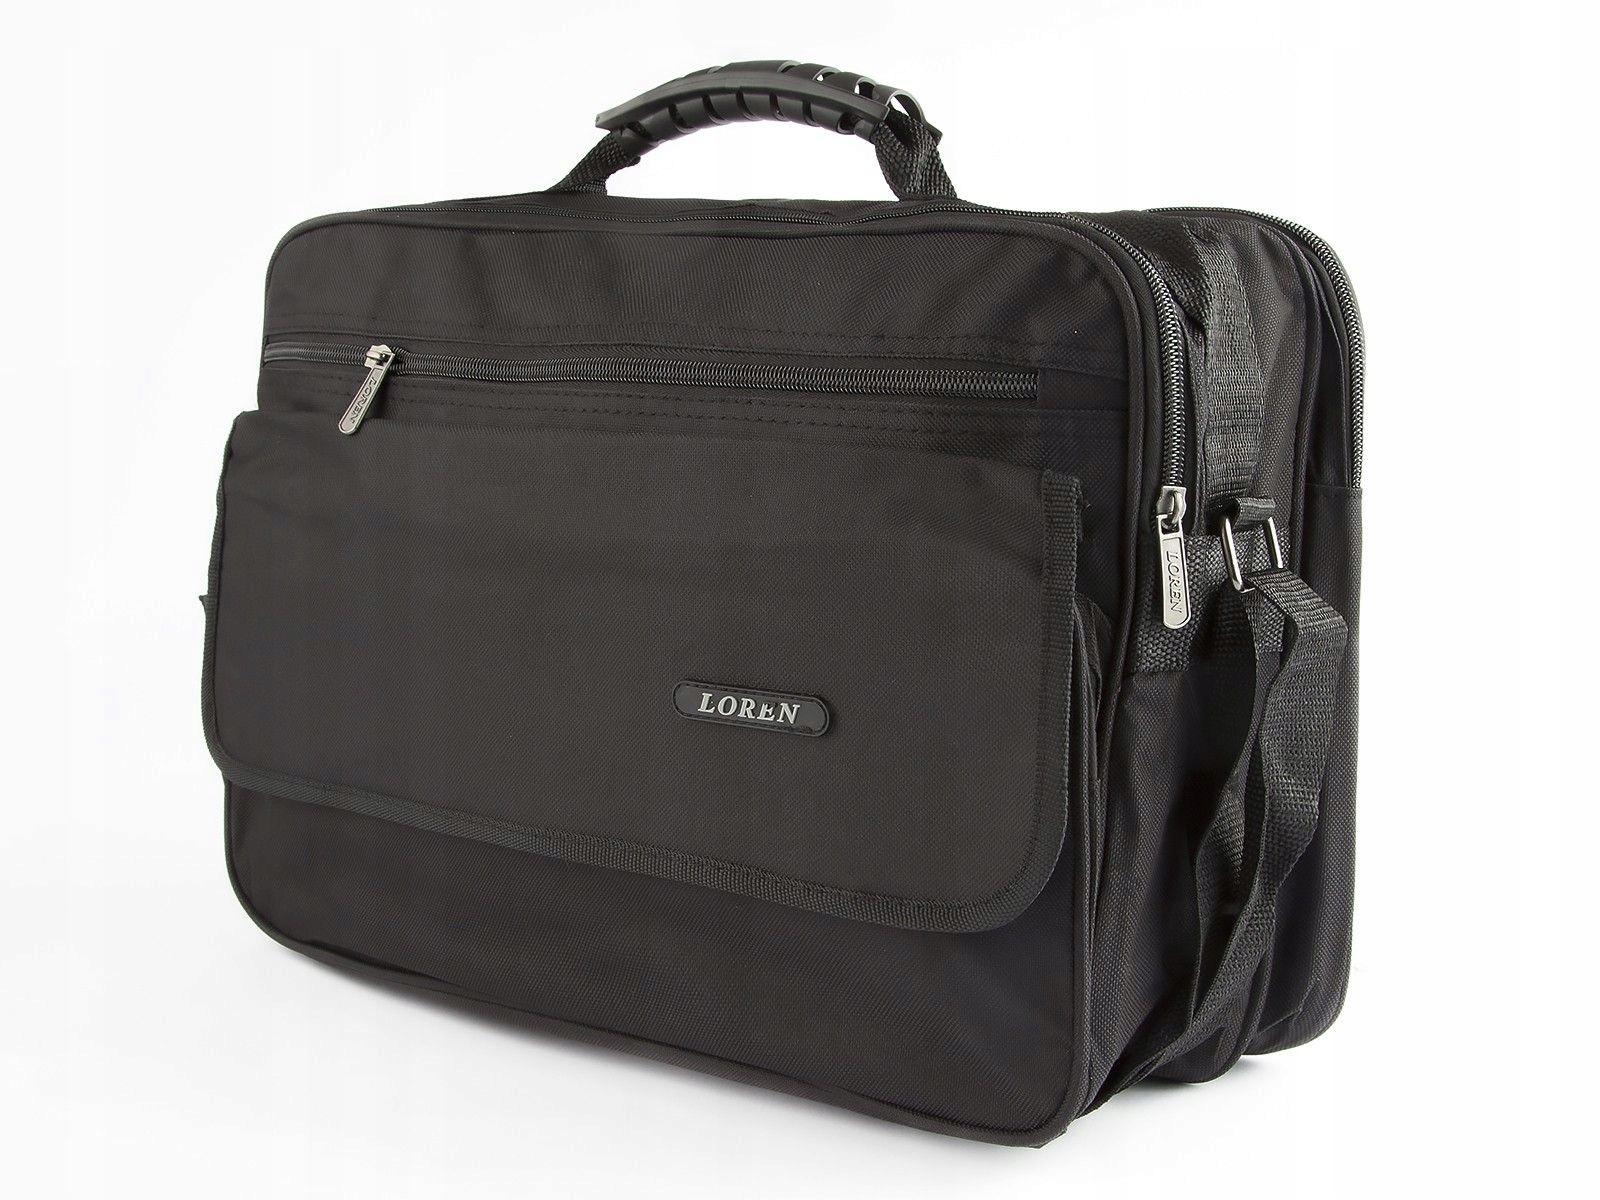 87d39f3f8051a Loren torba męska do pracy szkoły B5 na ramię A29 - 7587965430 ...